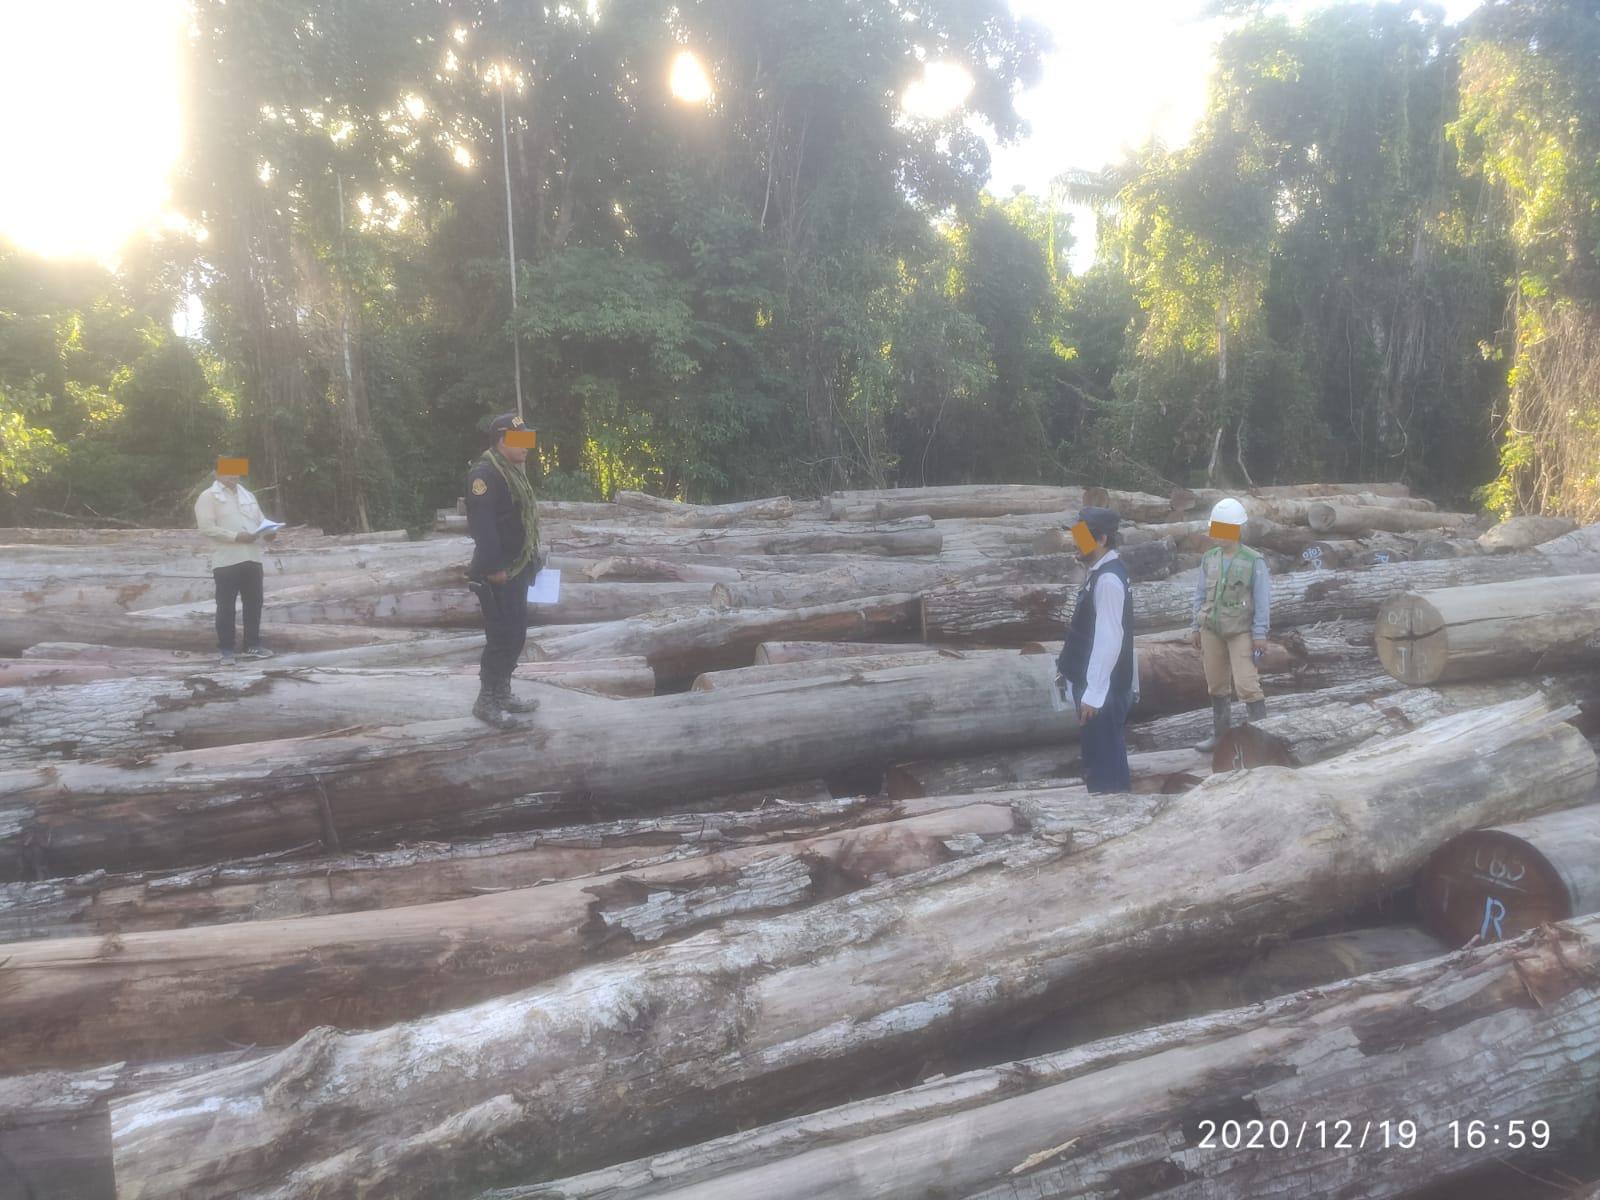 2,325m3 of logs seized in the Native Community of Fatima